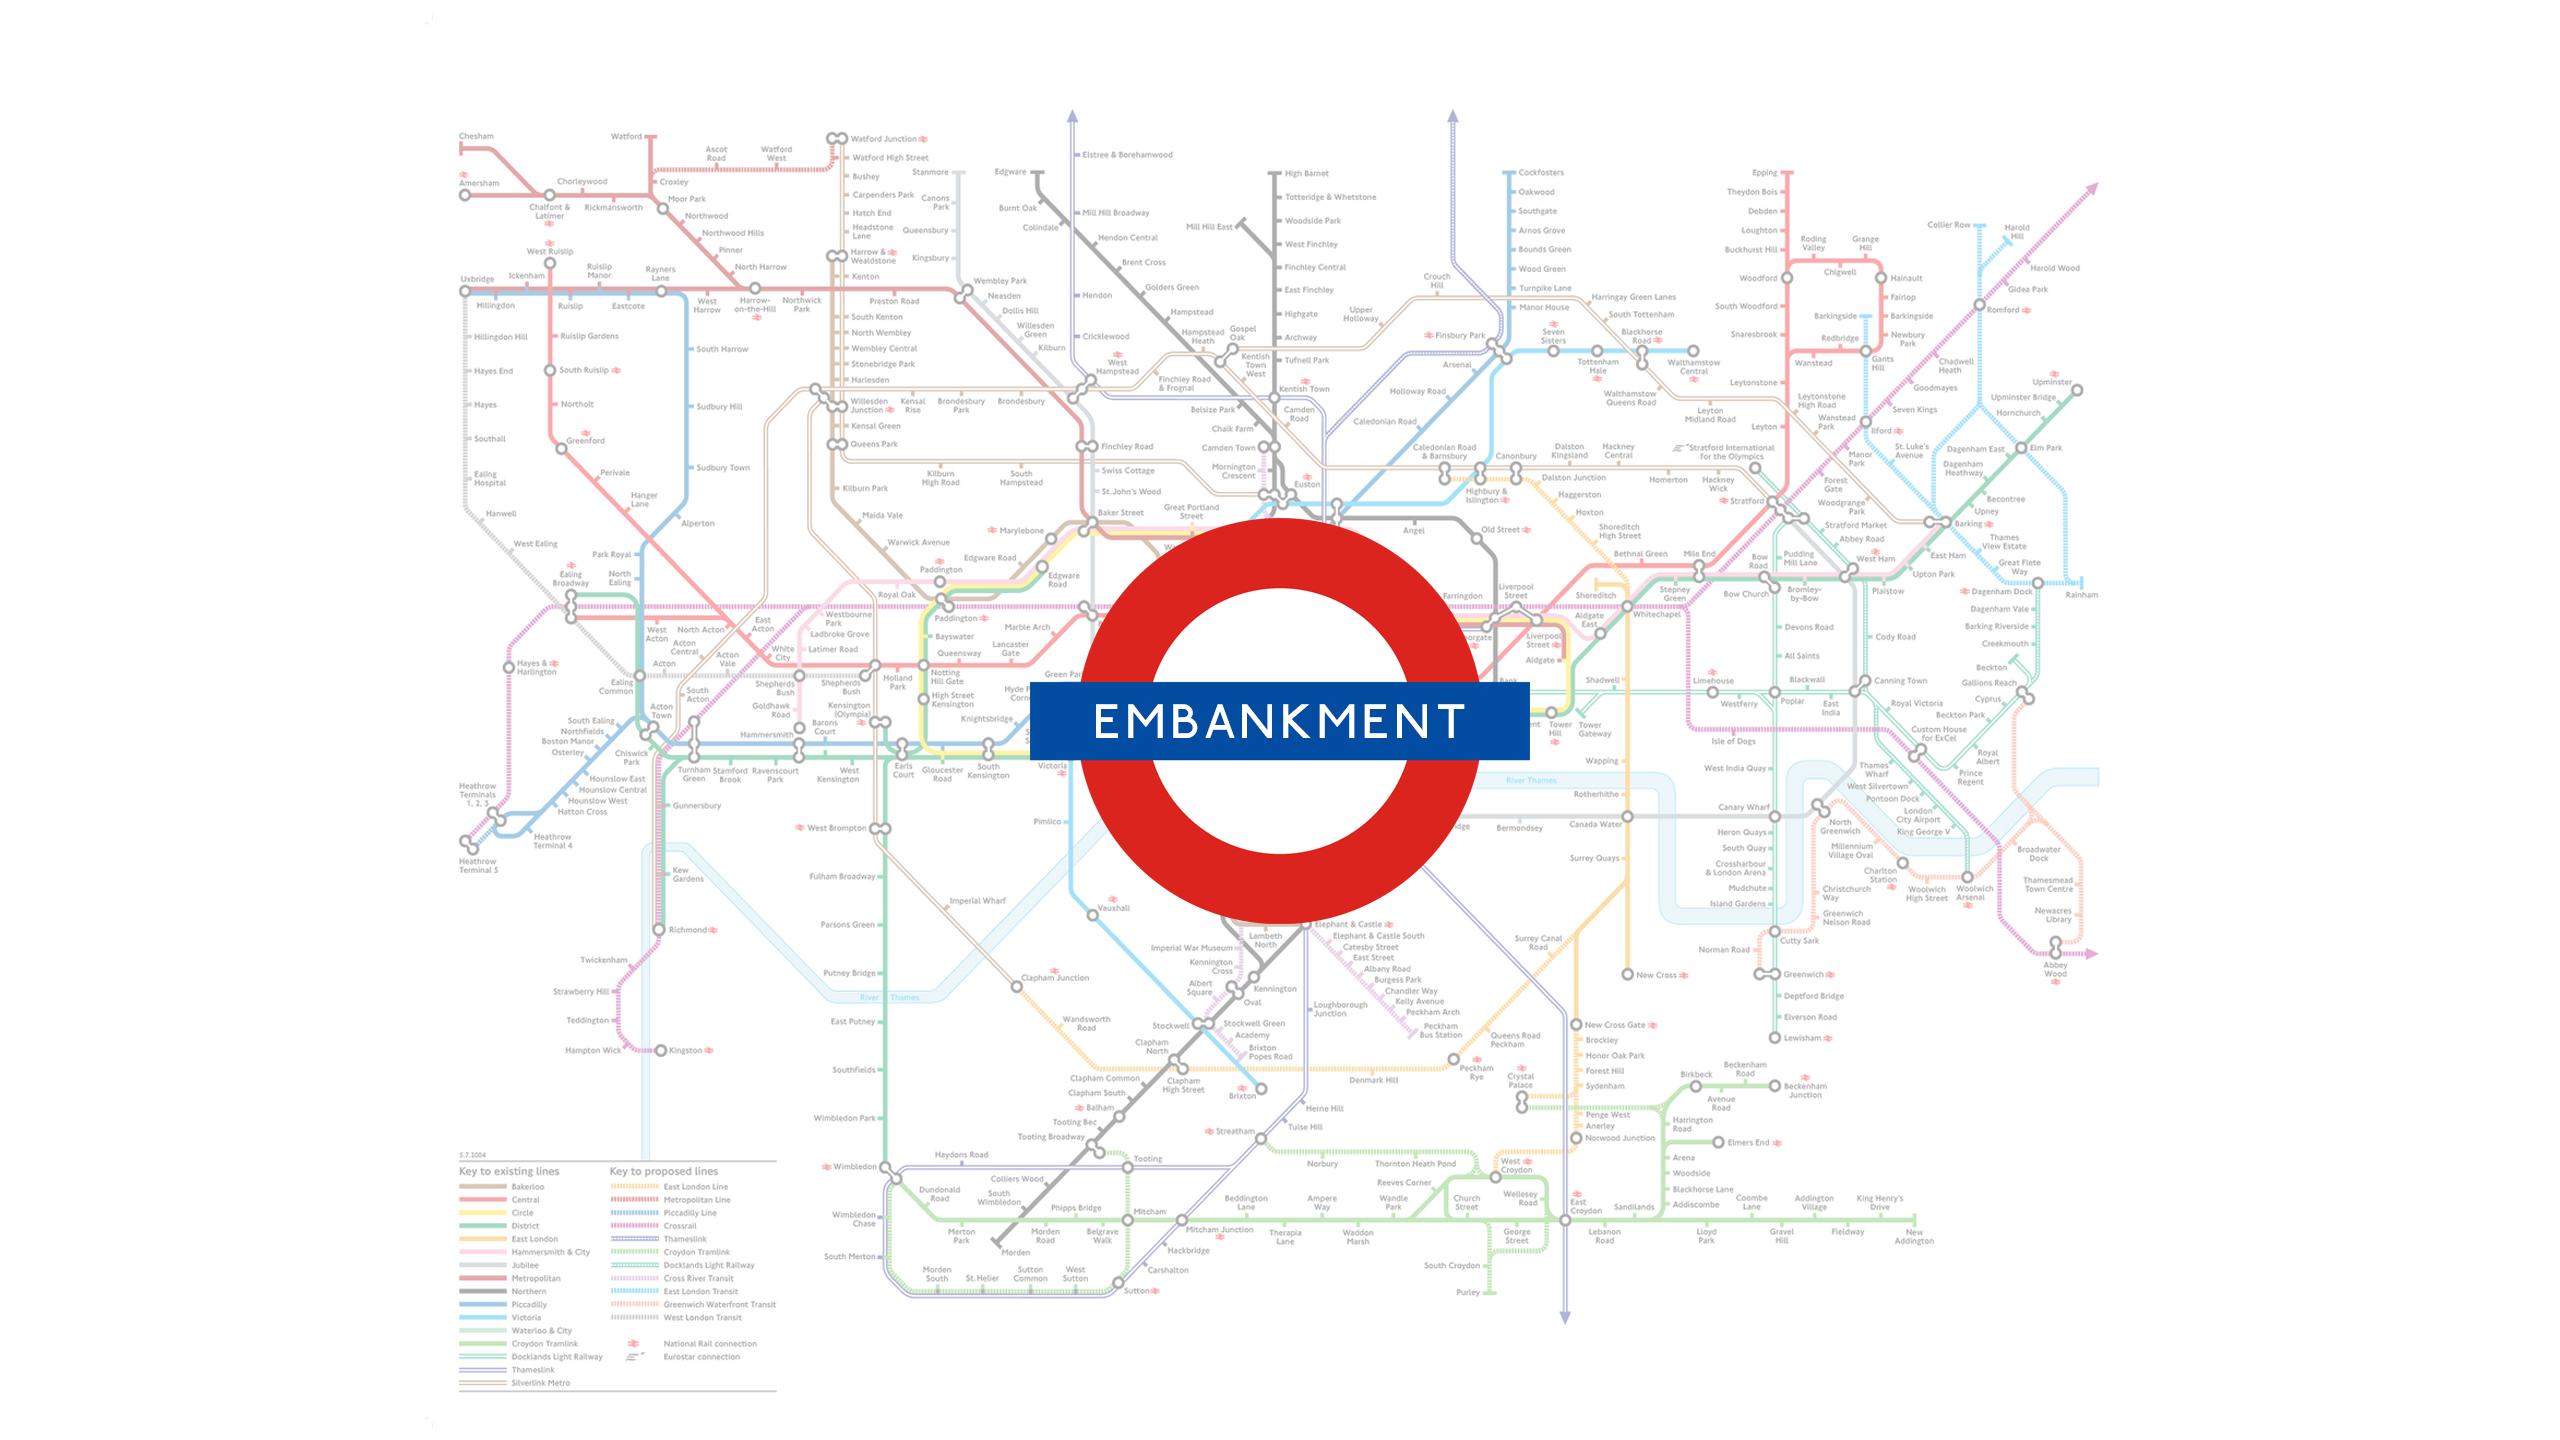 Embankment (Map)